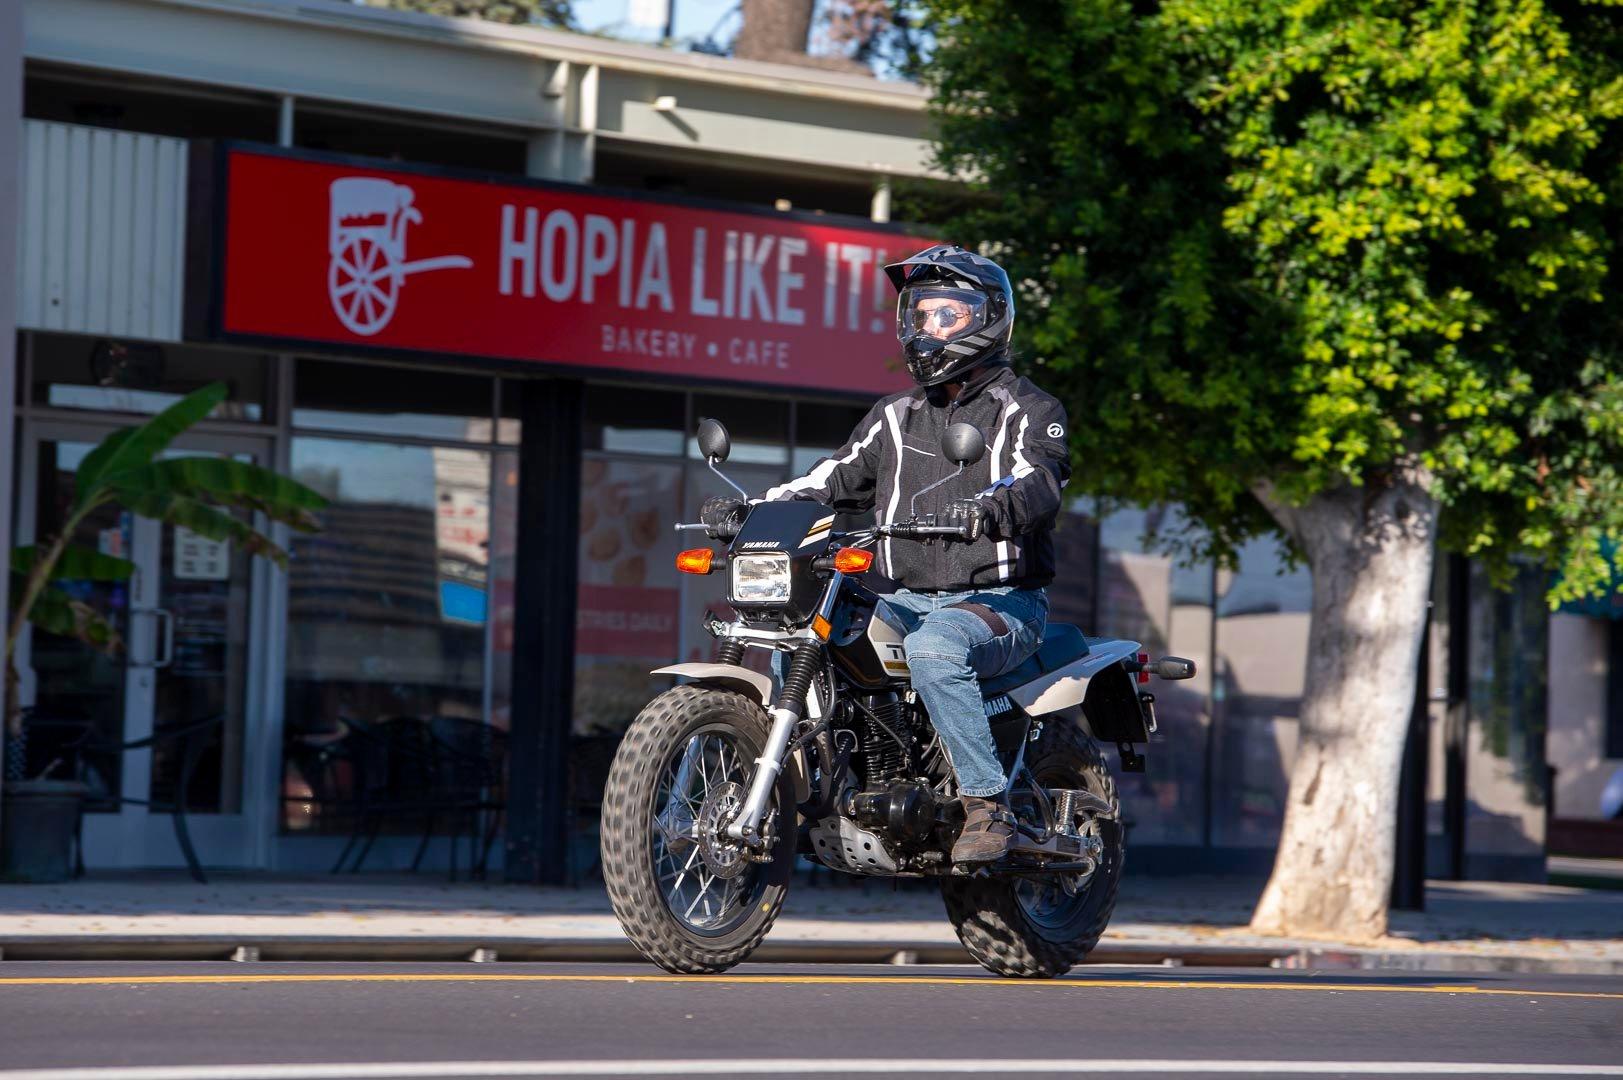 2020 Yamaha TW200 Review - Hopia Like It!